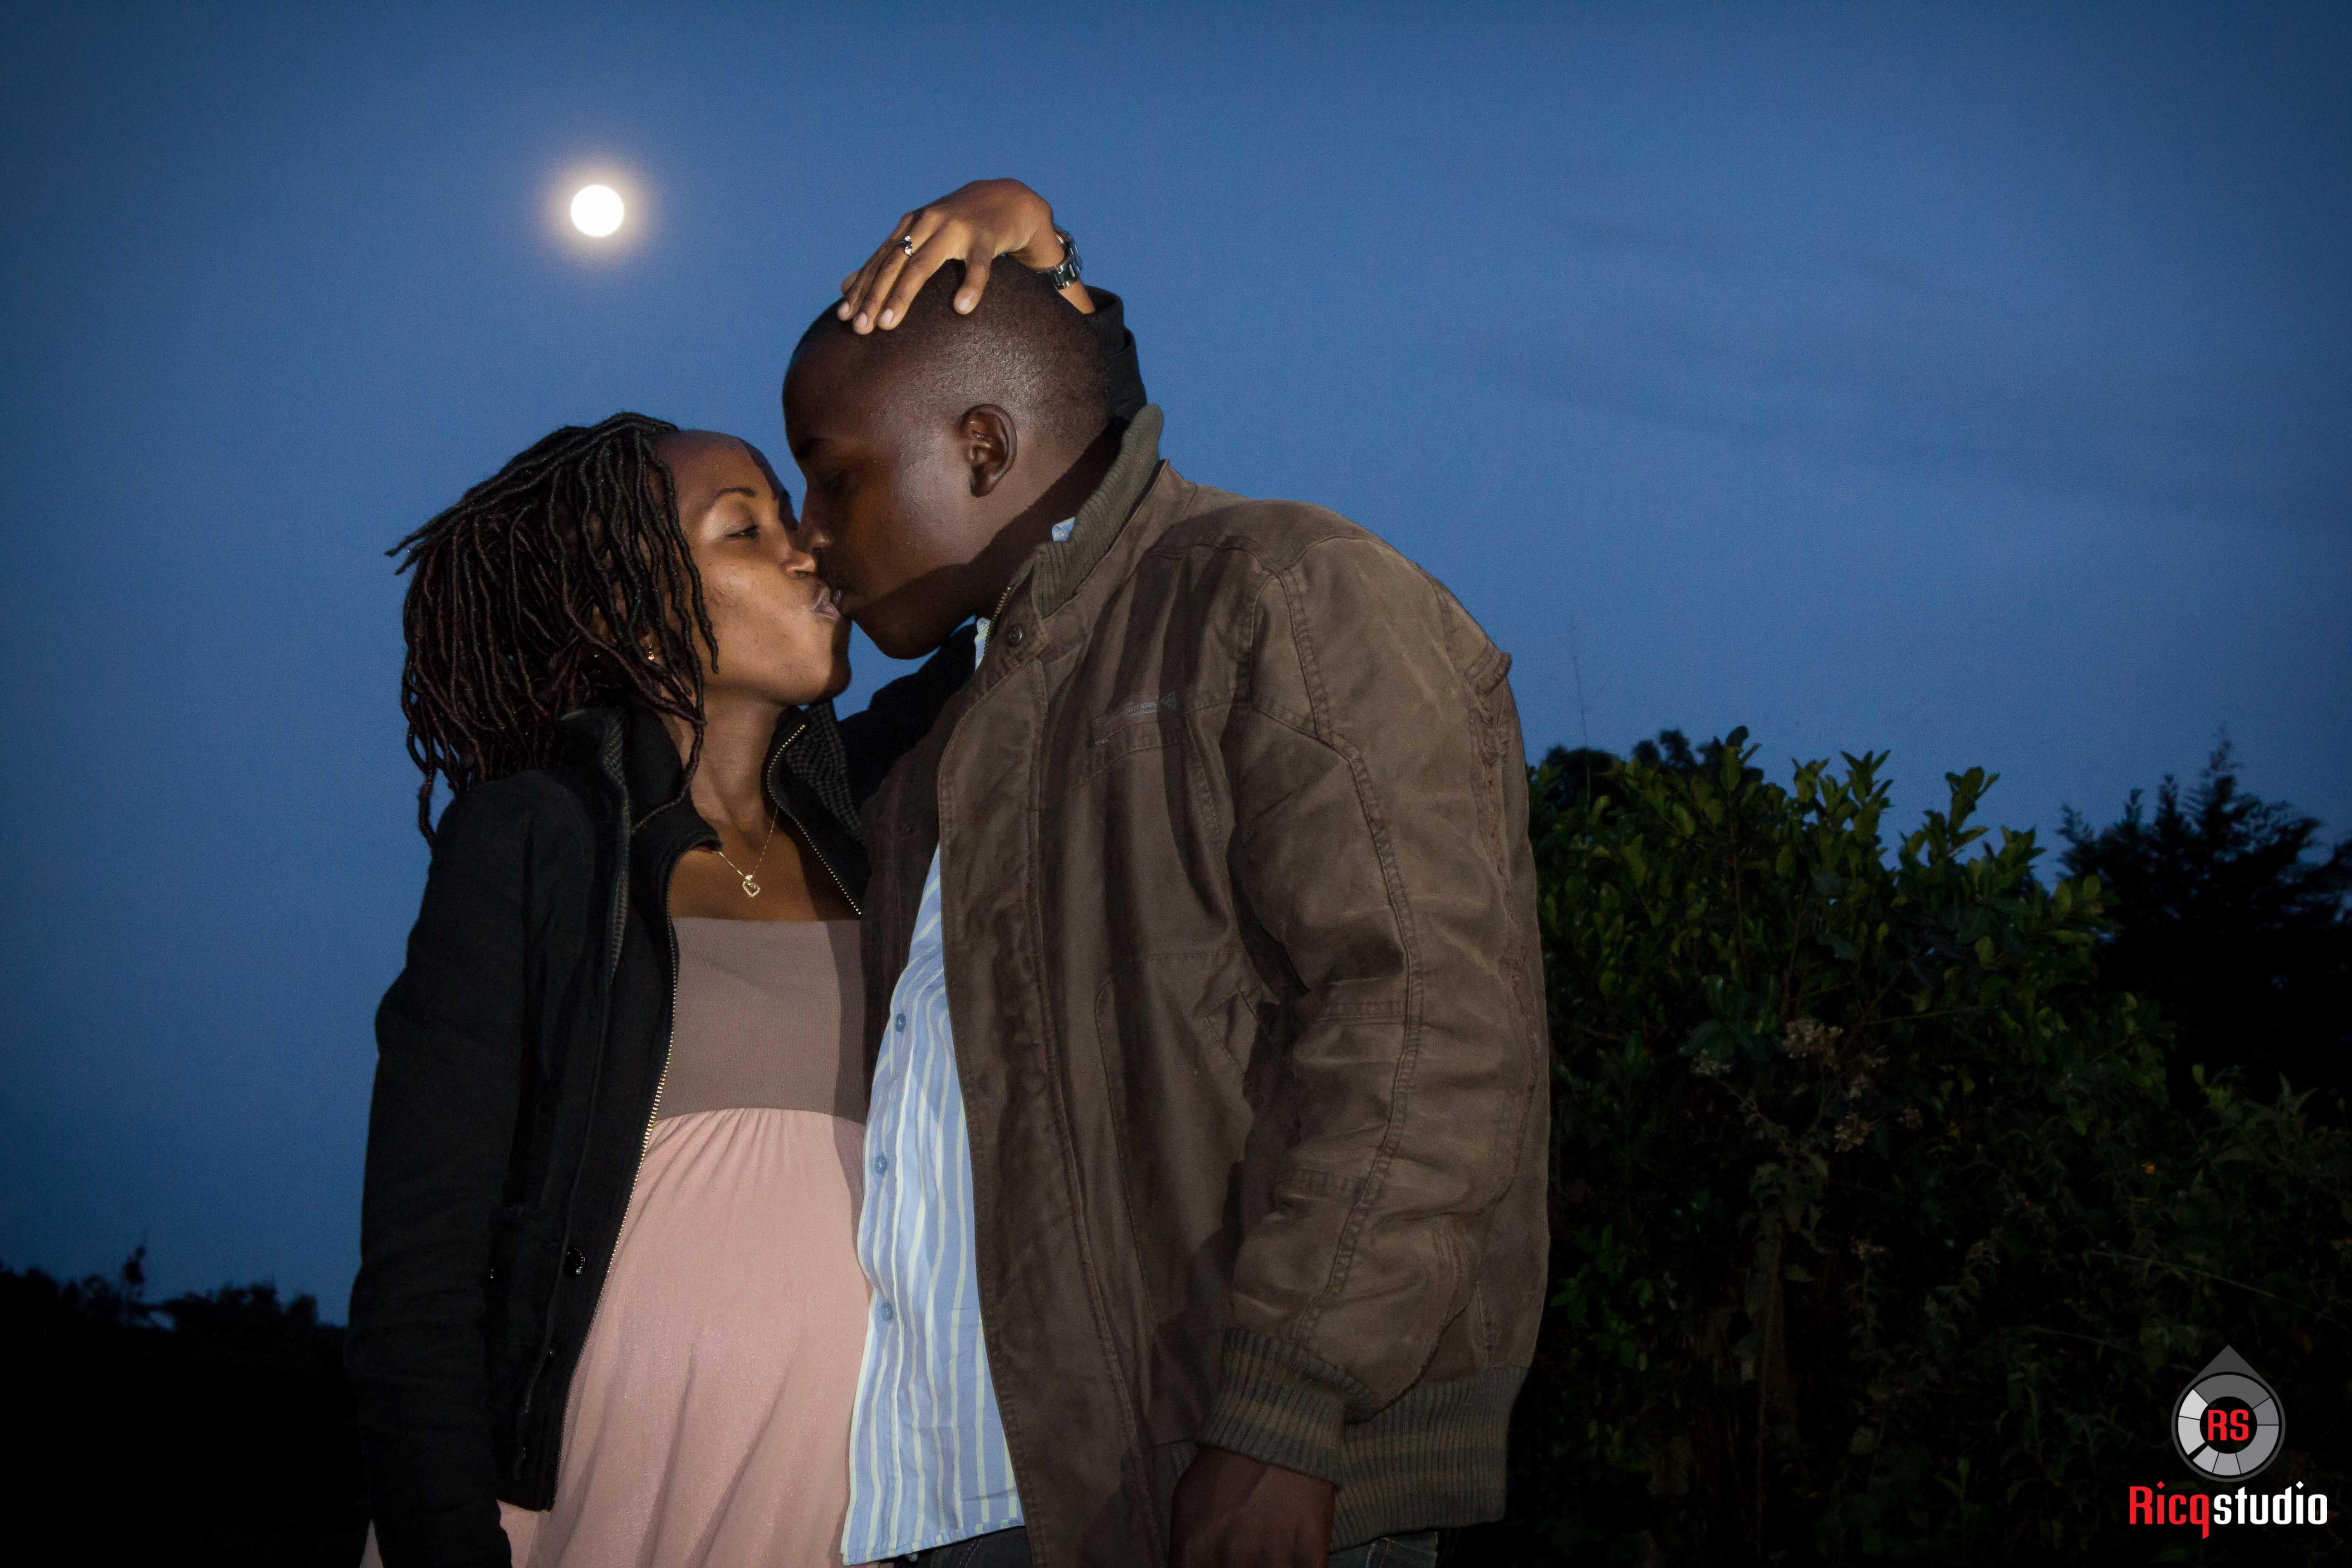 wedding photographer_ engagement in Kenya_ricqstudio-21